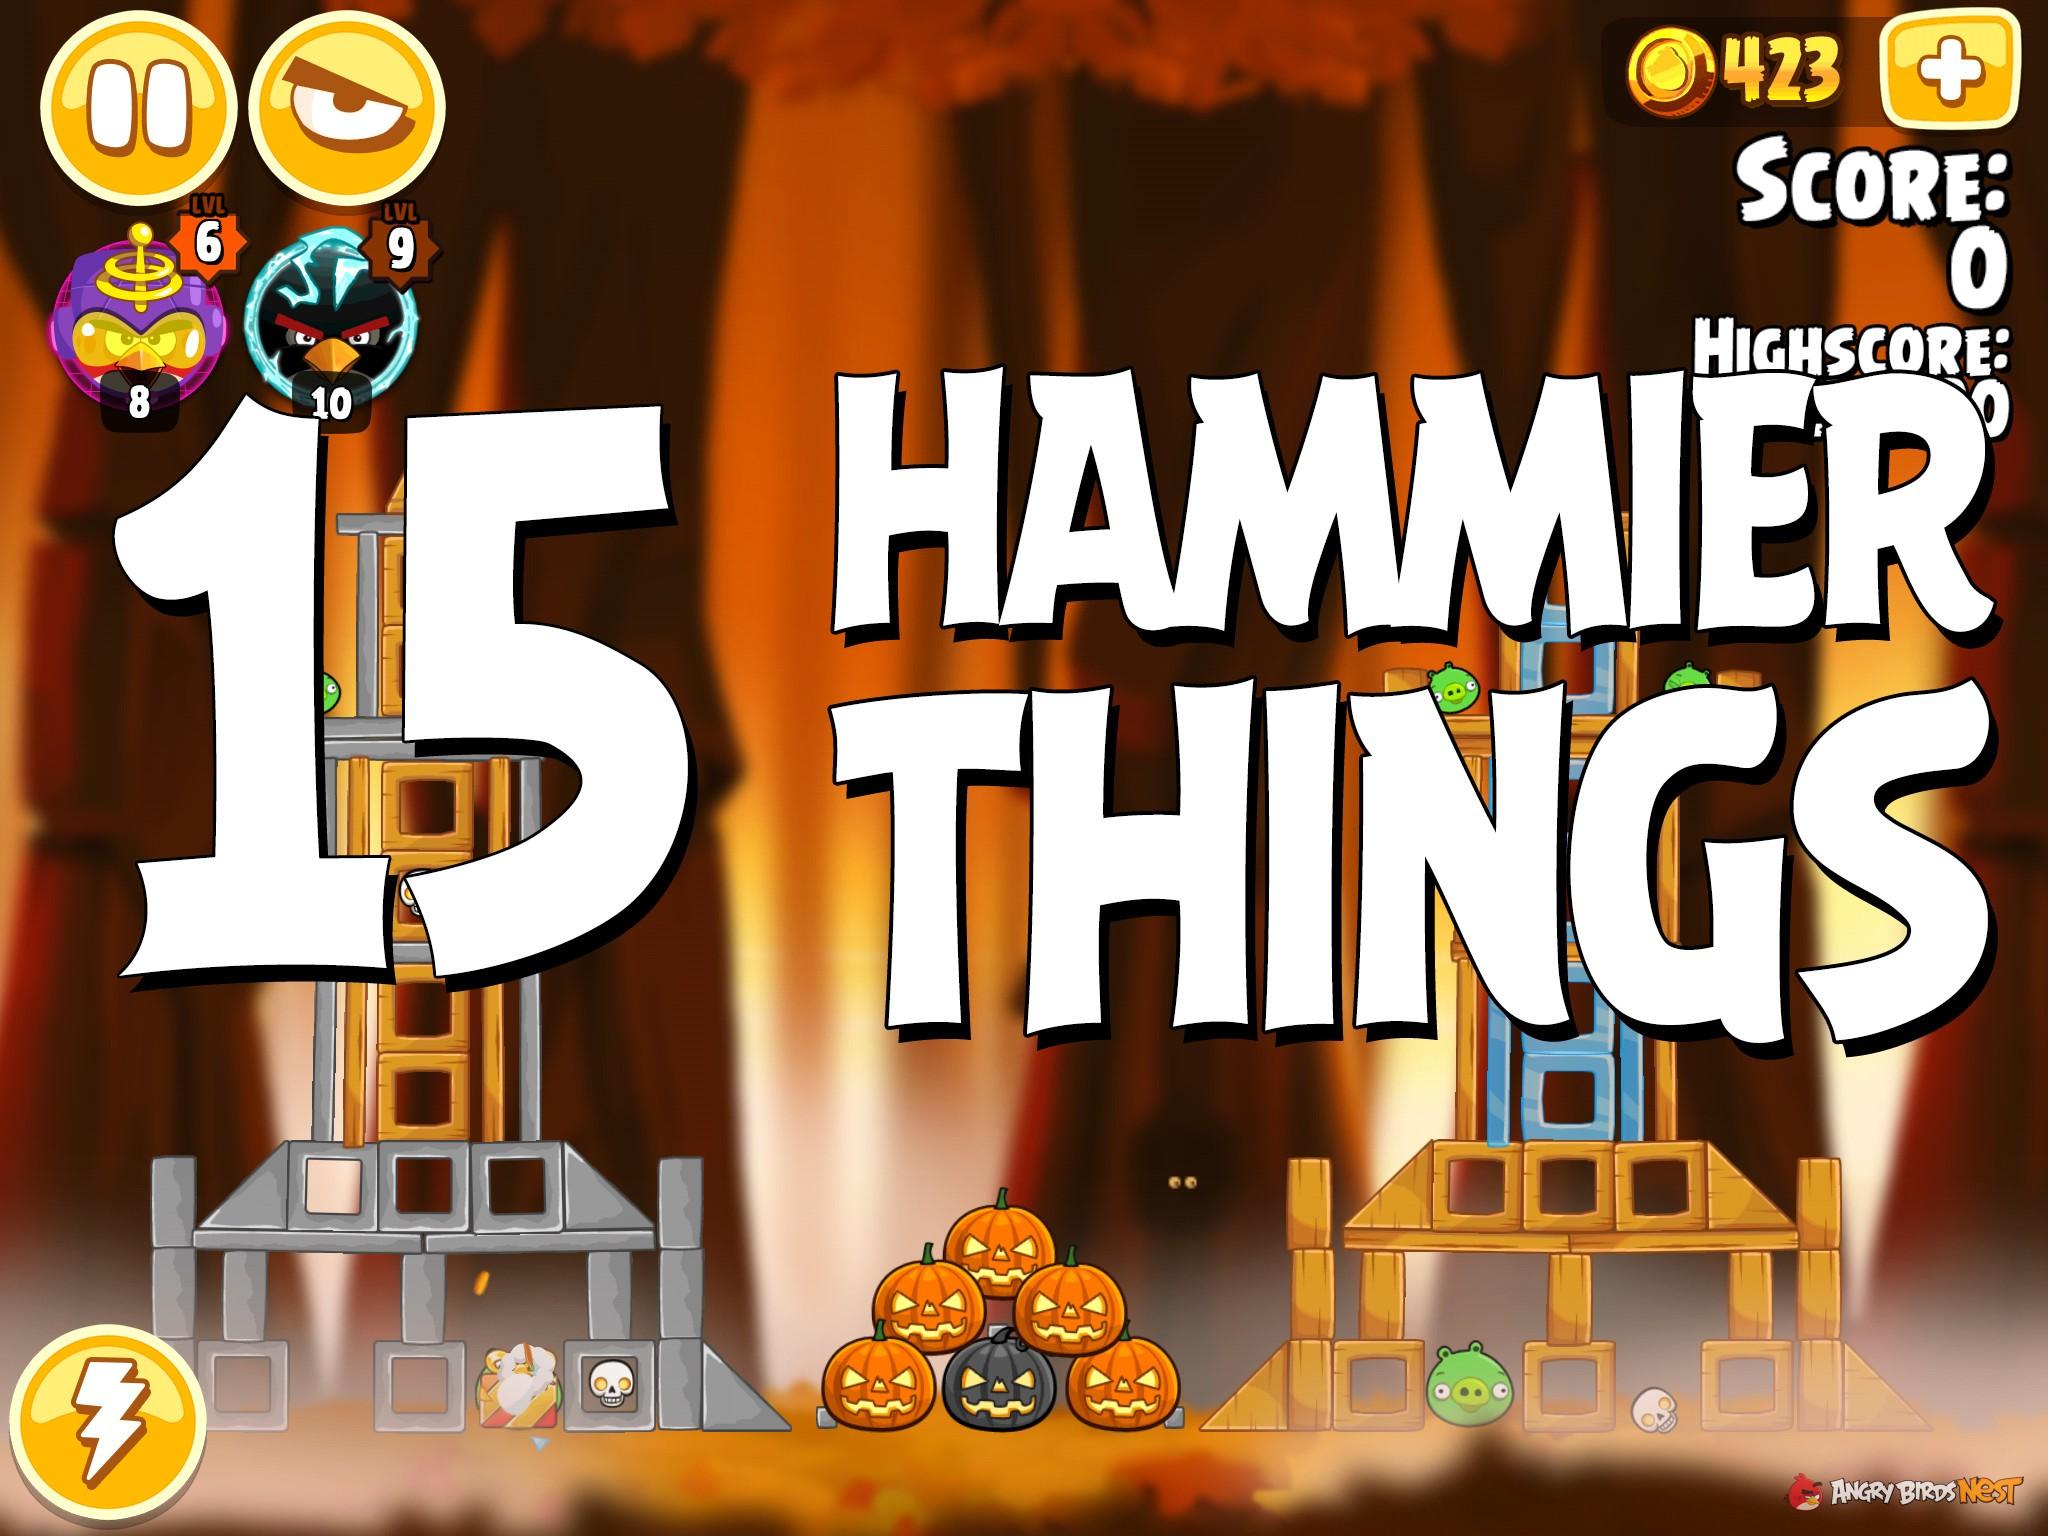 Angry Birds Hammier Things angry birds seasons hammier things level 1-15 walkthrough